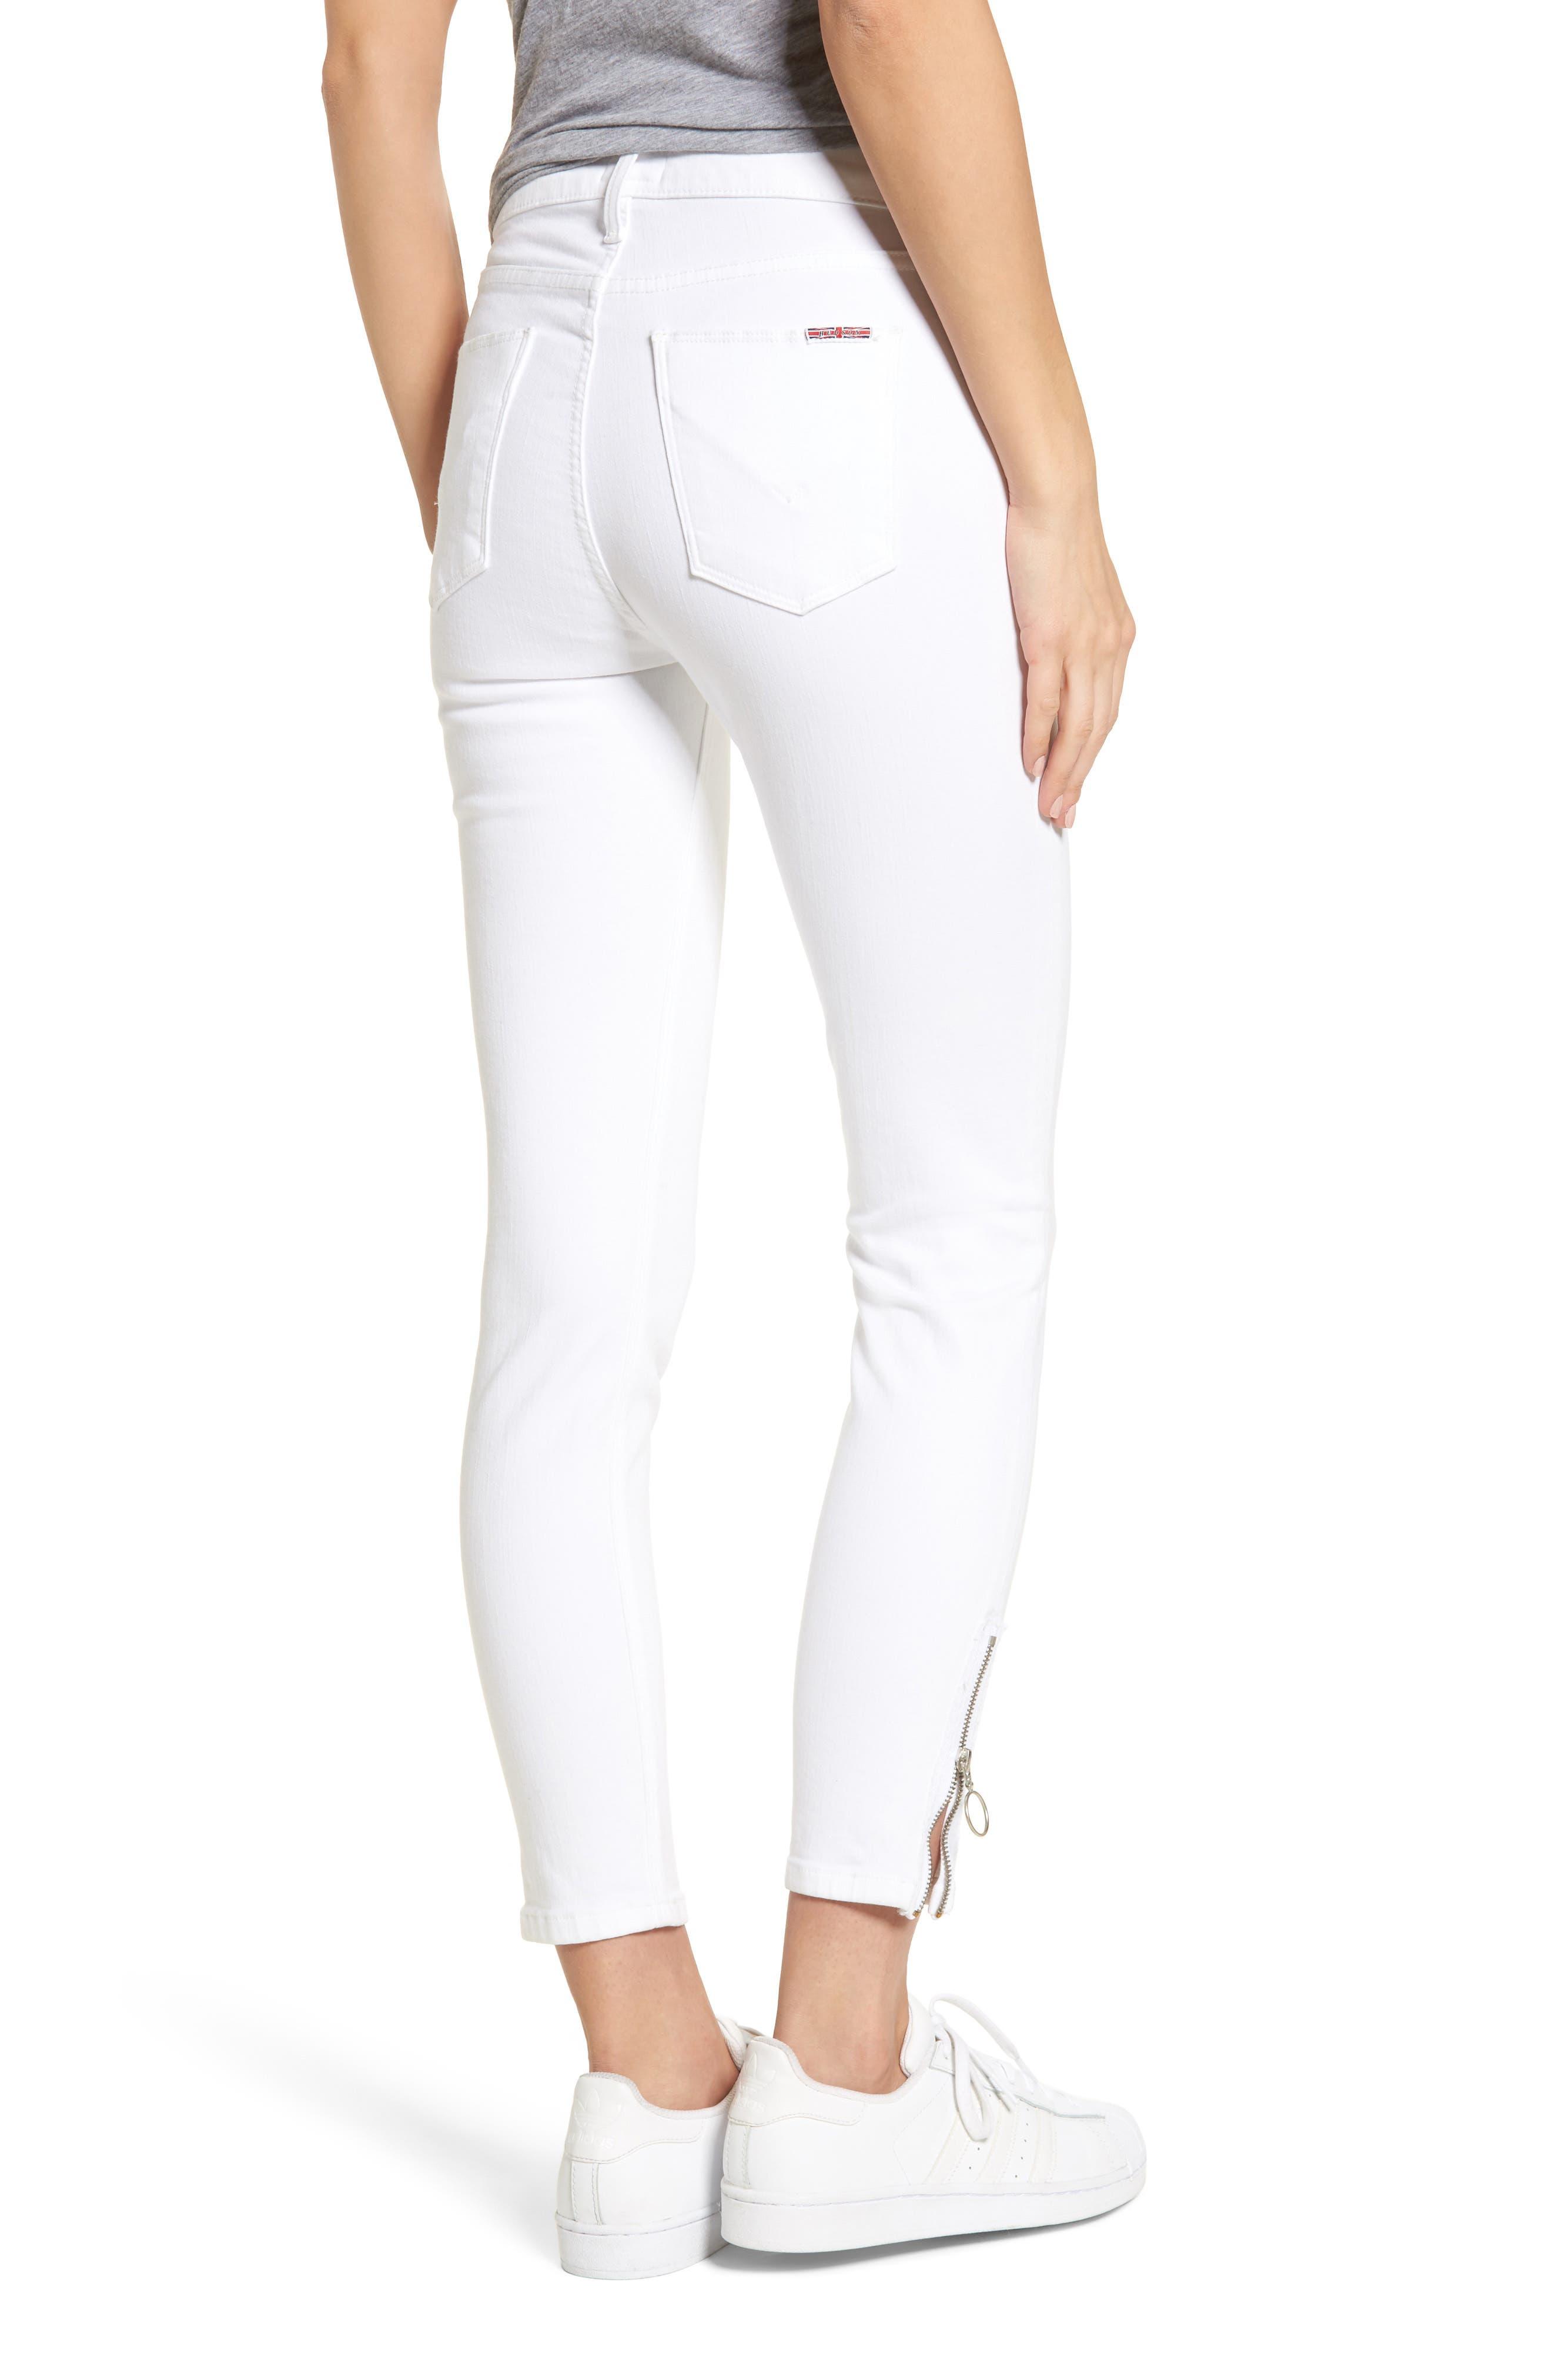 Barbara High Waist Ankle Skinny Jeans,                             Alternate thumbnail 2, color,                             110